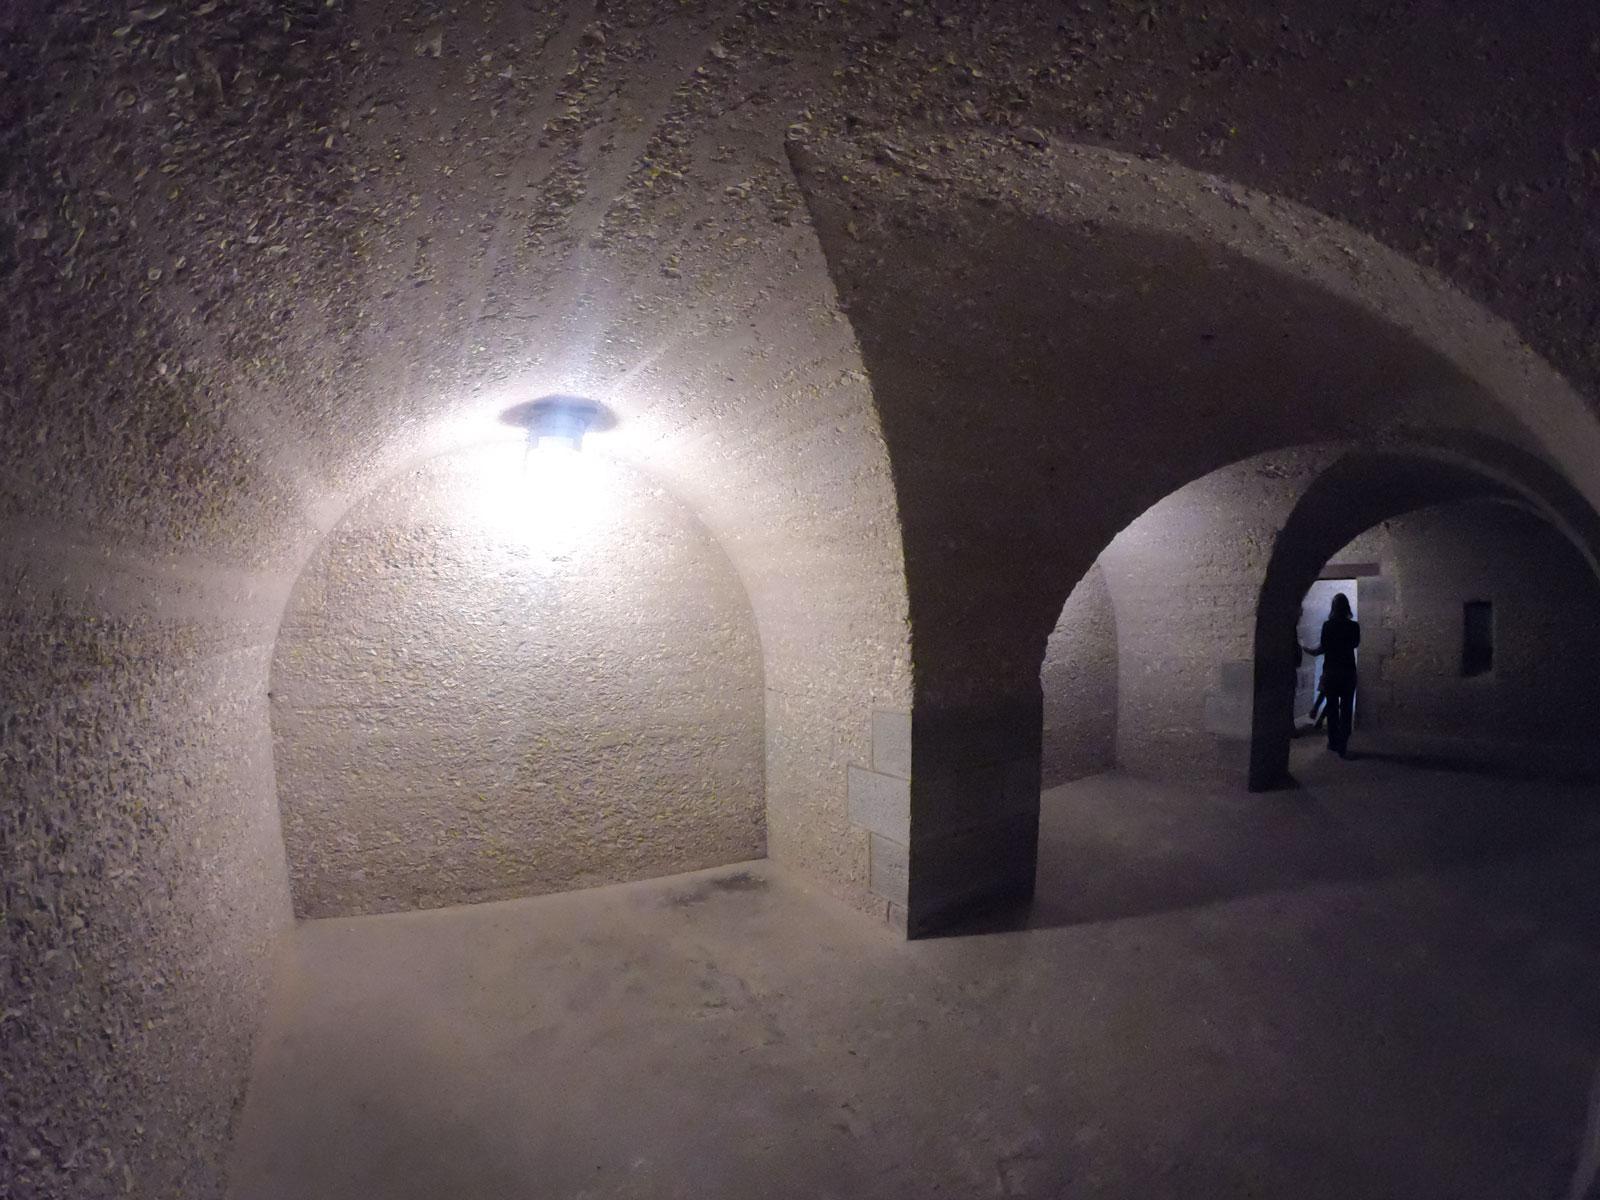 Inside arched brick room at Fort Pulaski National Monument, Georgia